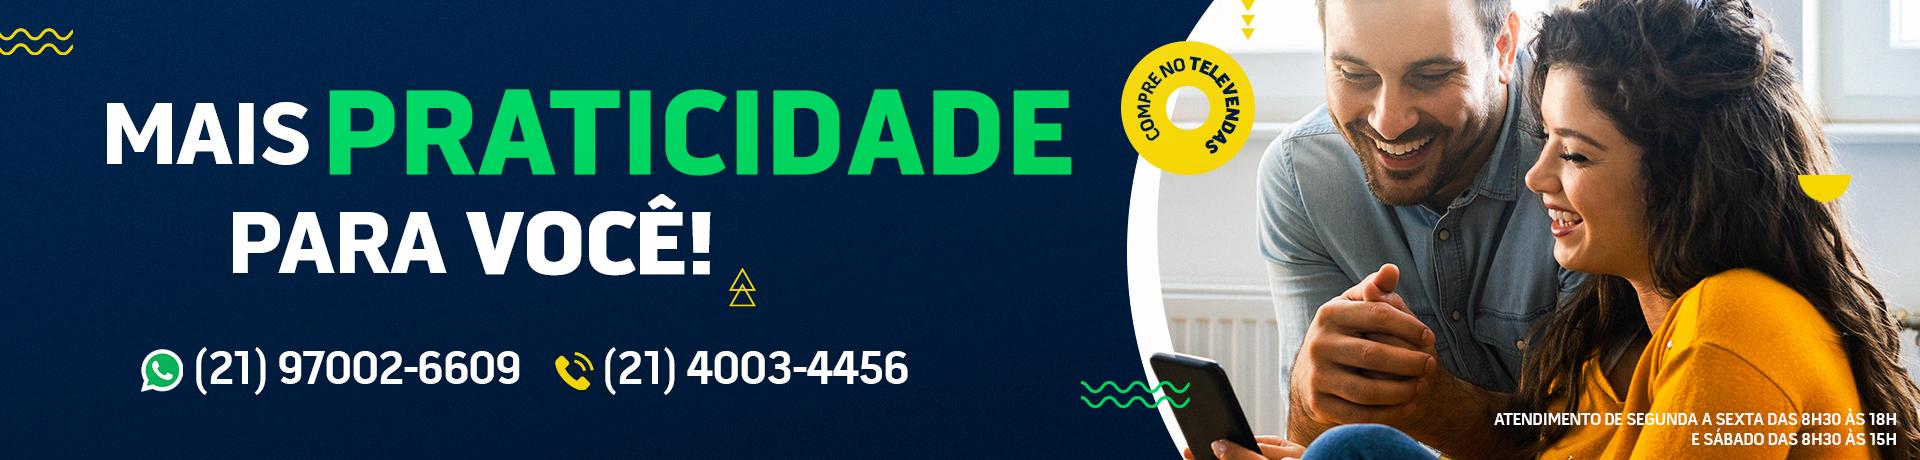 Whatsapp - Televendas